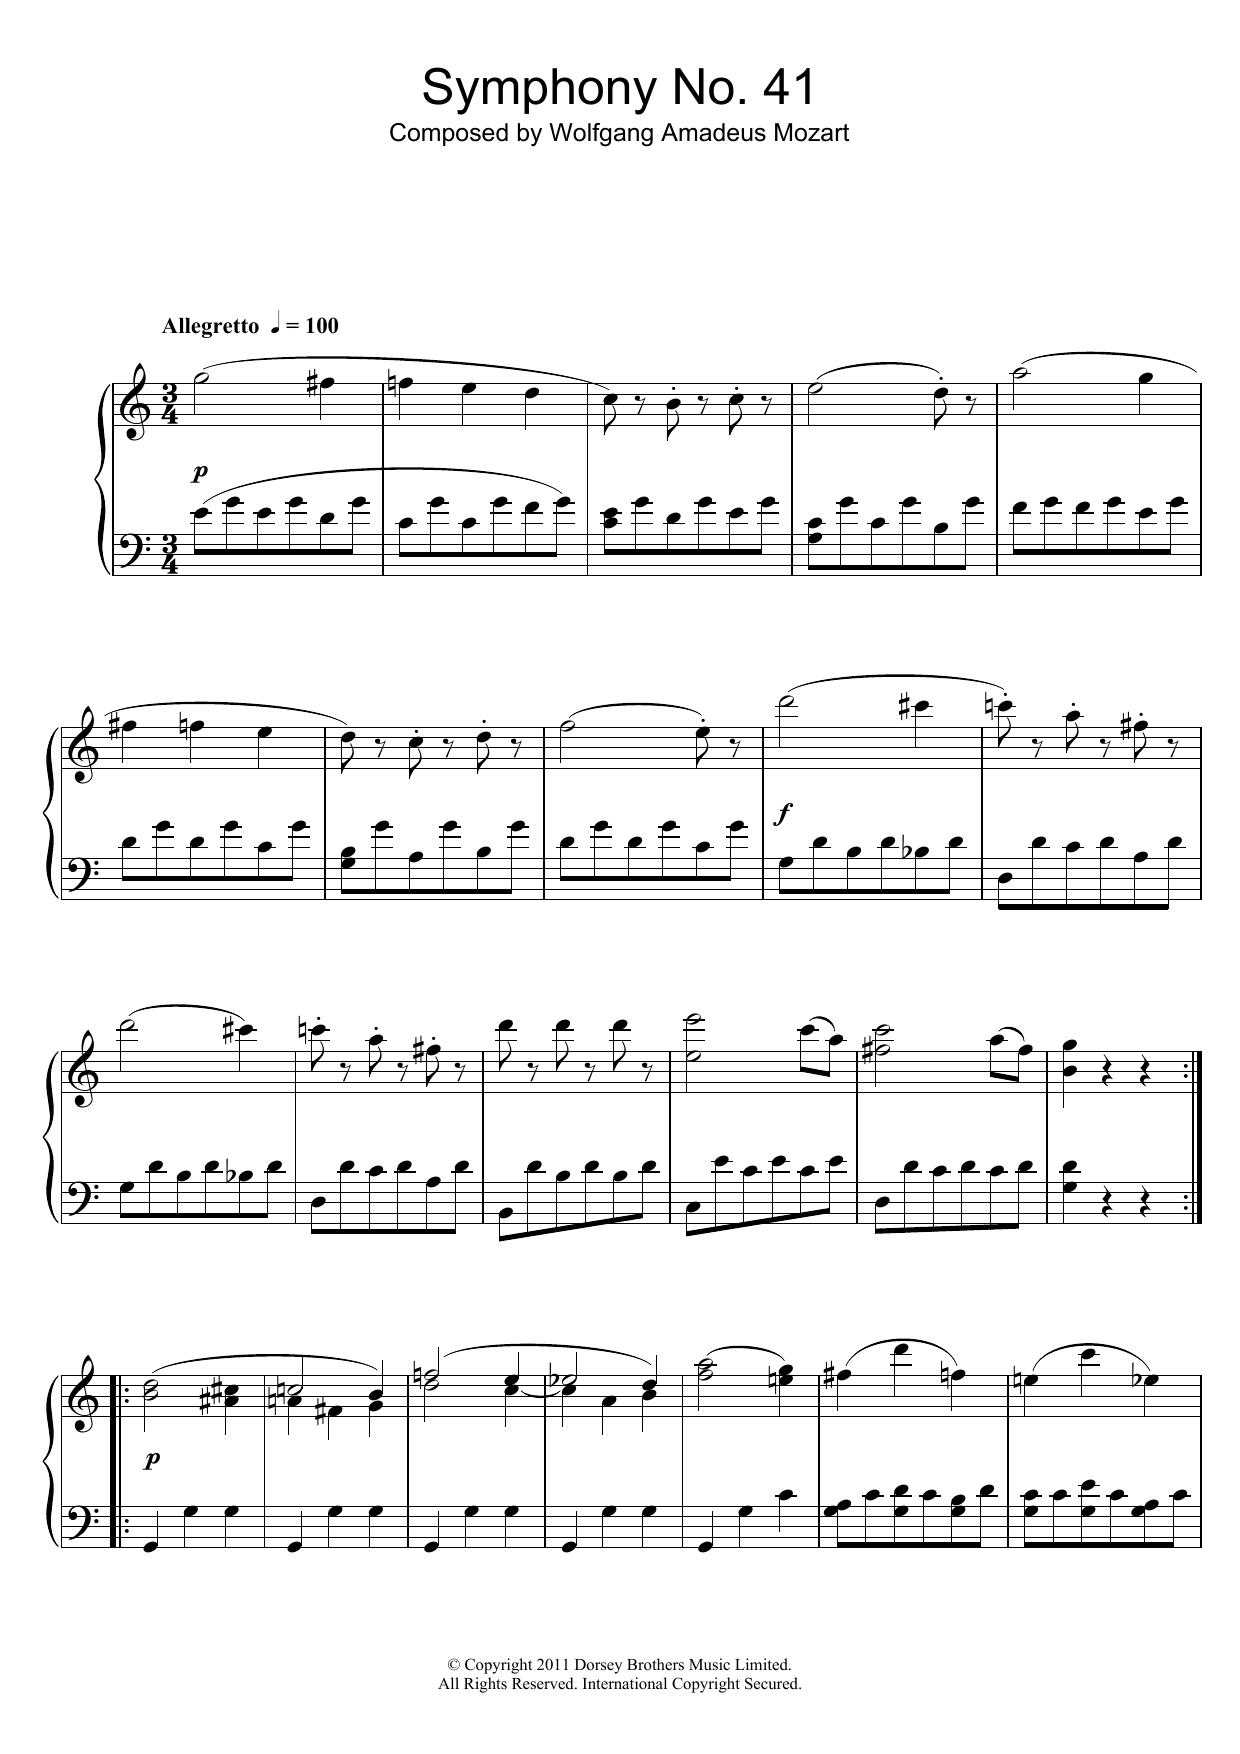 Wolfgang Amadeus Mozart - Symphony No.41 'Jupiter' (3rd Movement: Minuet)